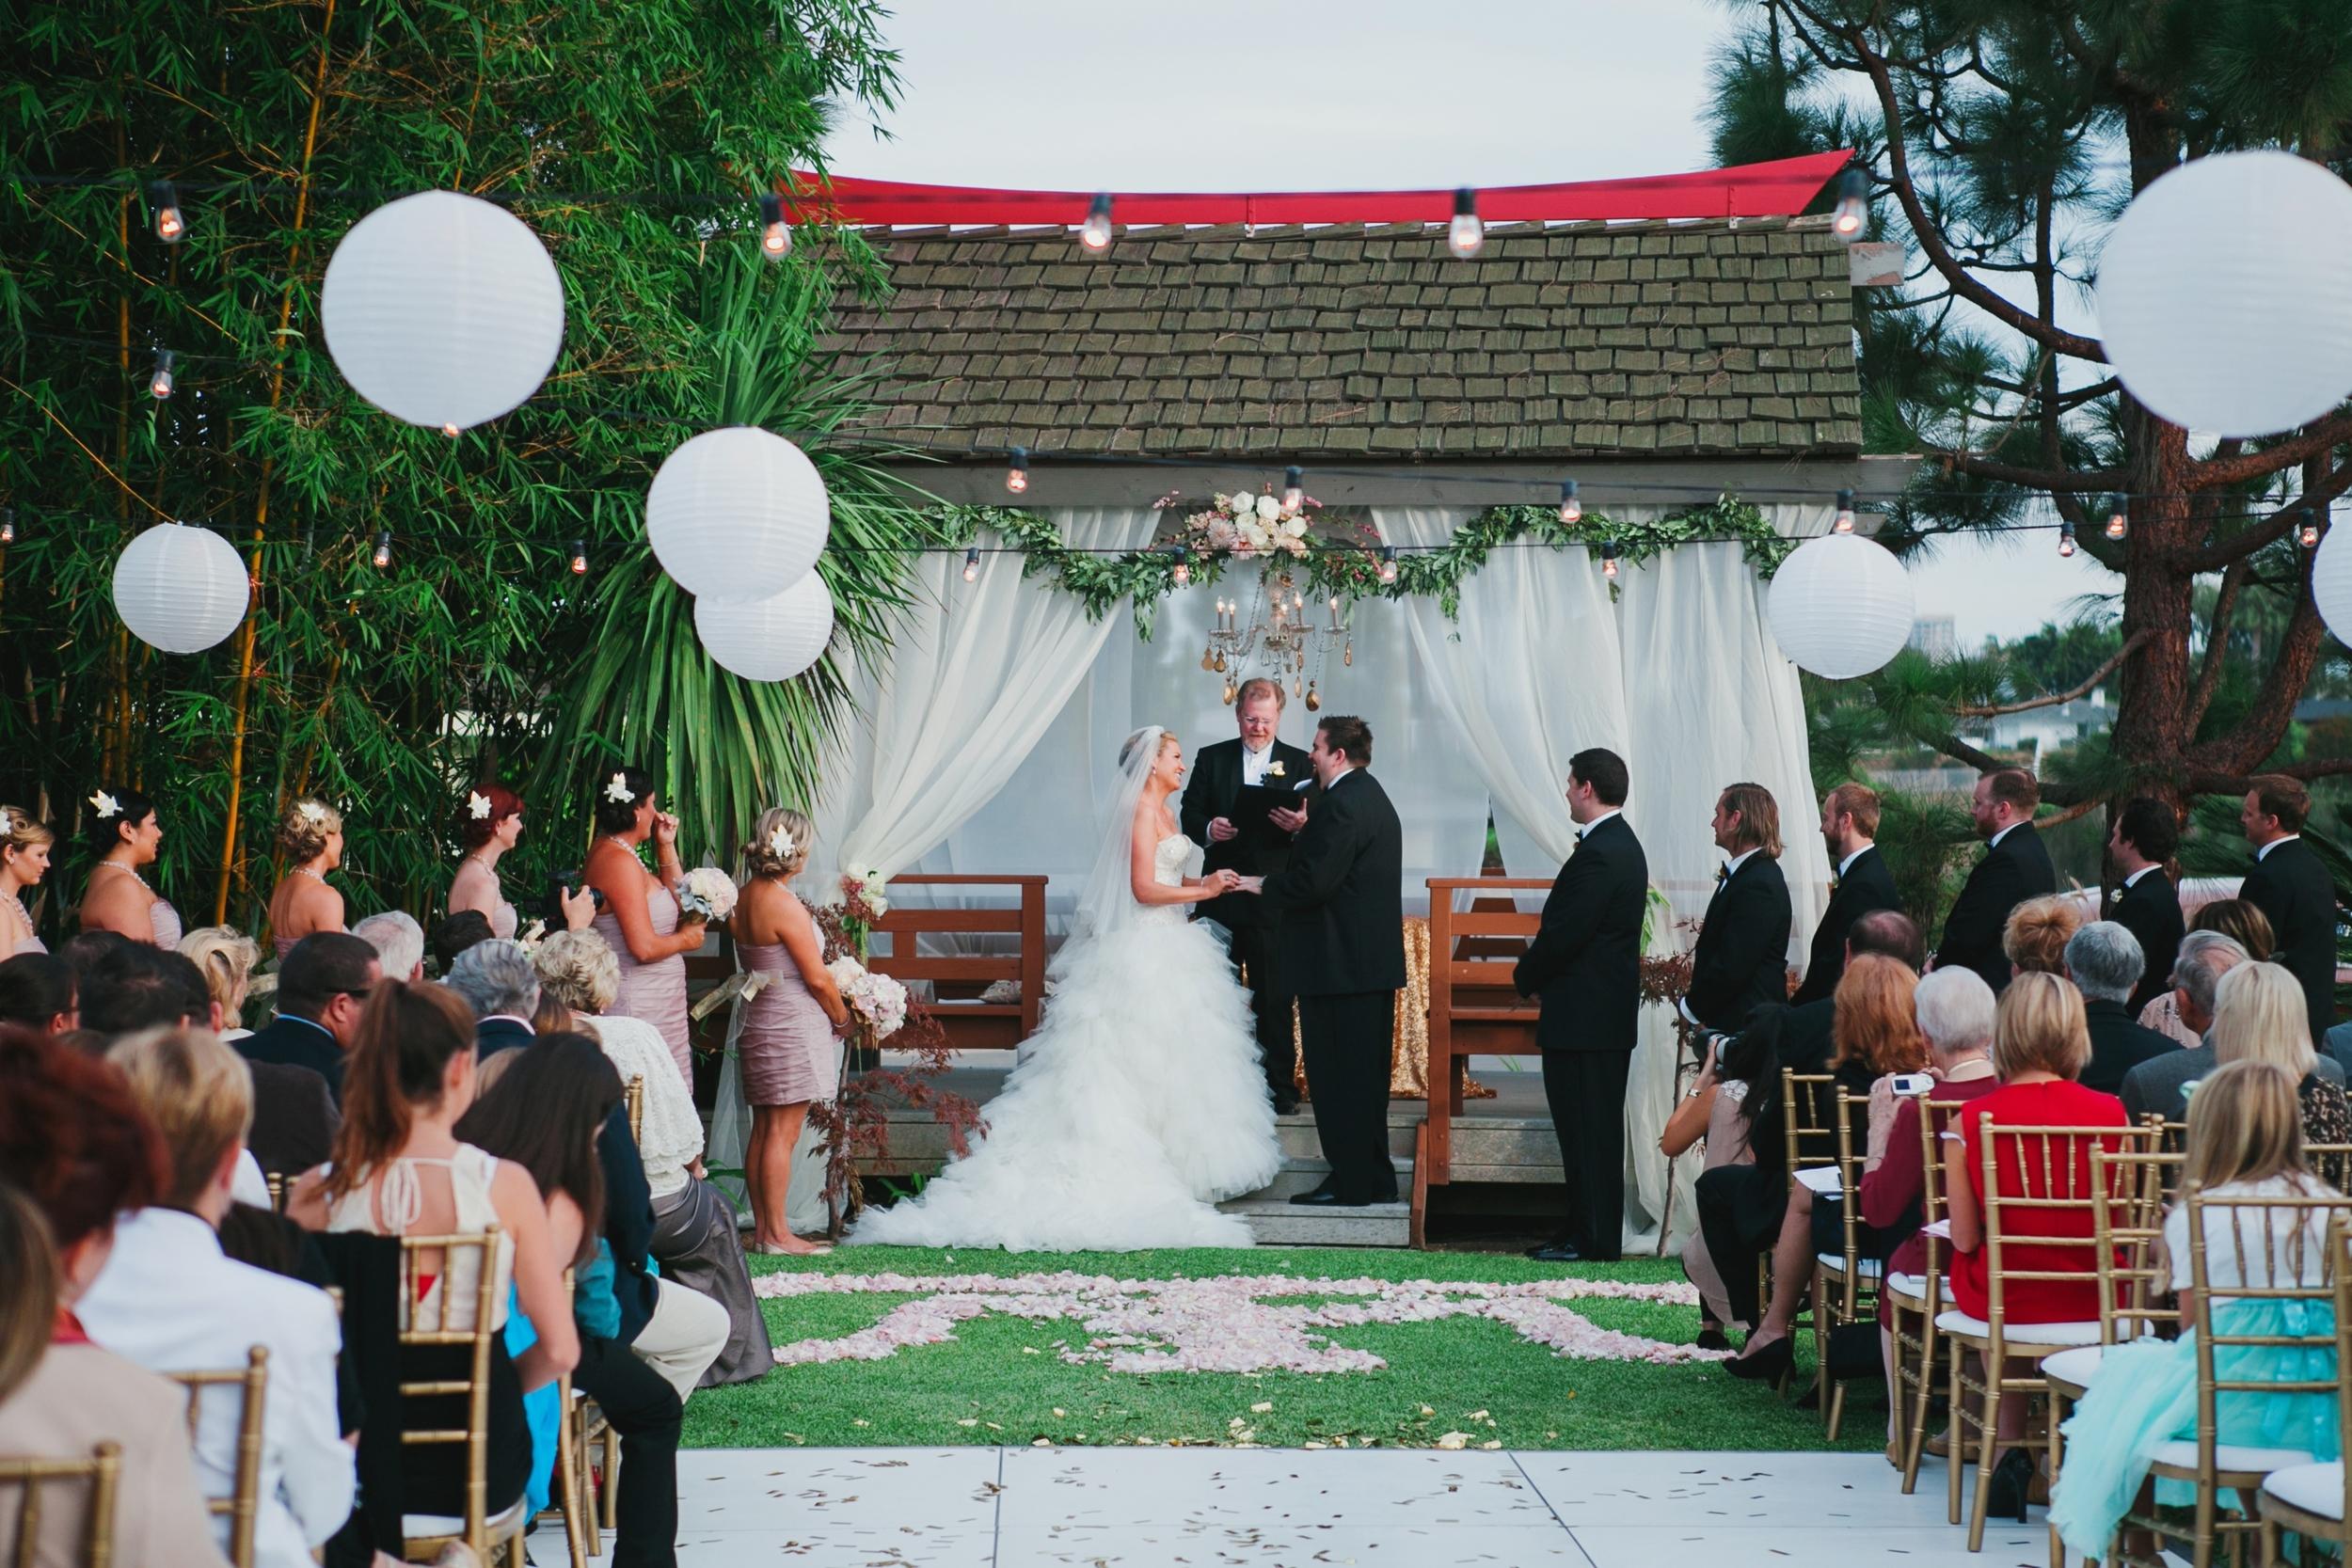 The-Suitcase-Studio-Timree-Matt-Lifestyle-Wedding-Photographer-052.jpg